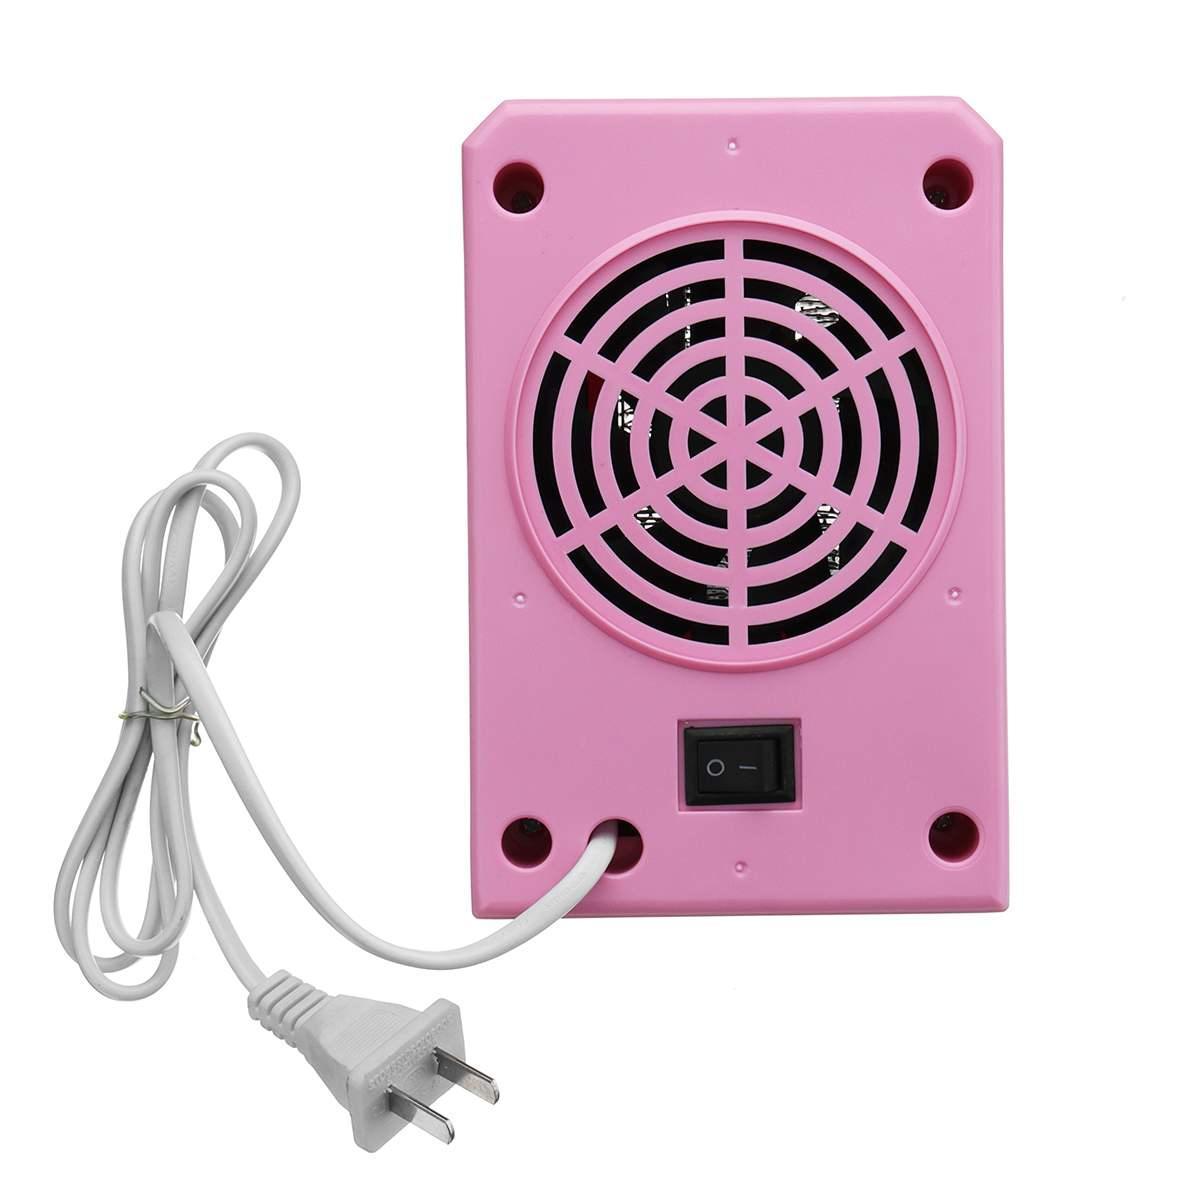 500W 220V Portable <font><b>Mini</b></font> <font><b>Space</b></font> US Home Office Desk Conditioner Heating Shower